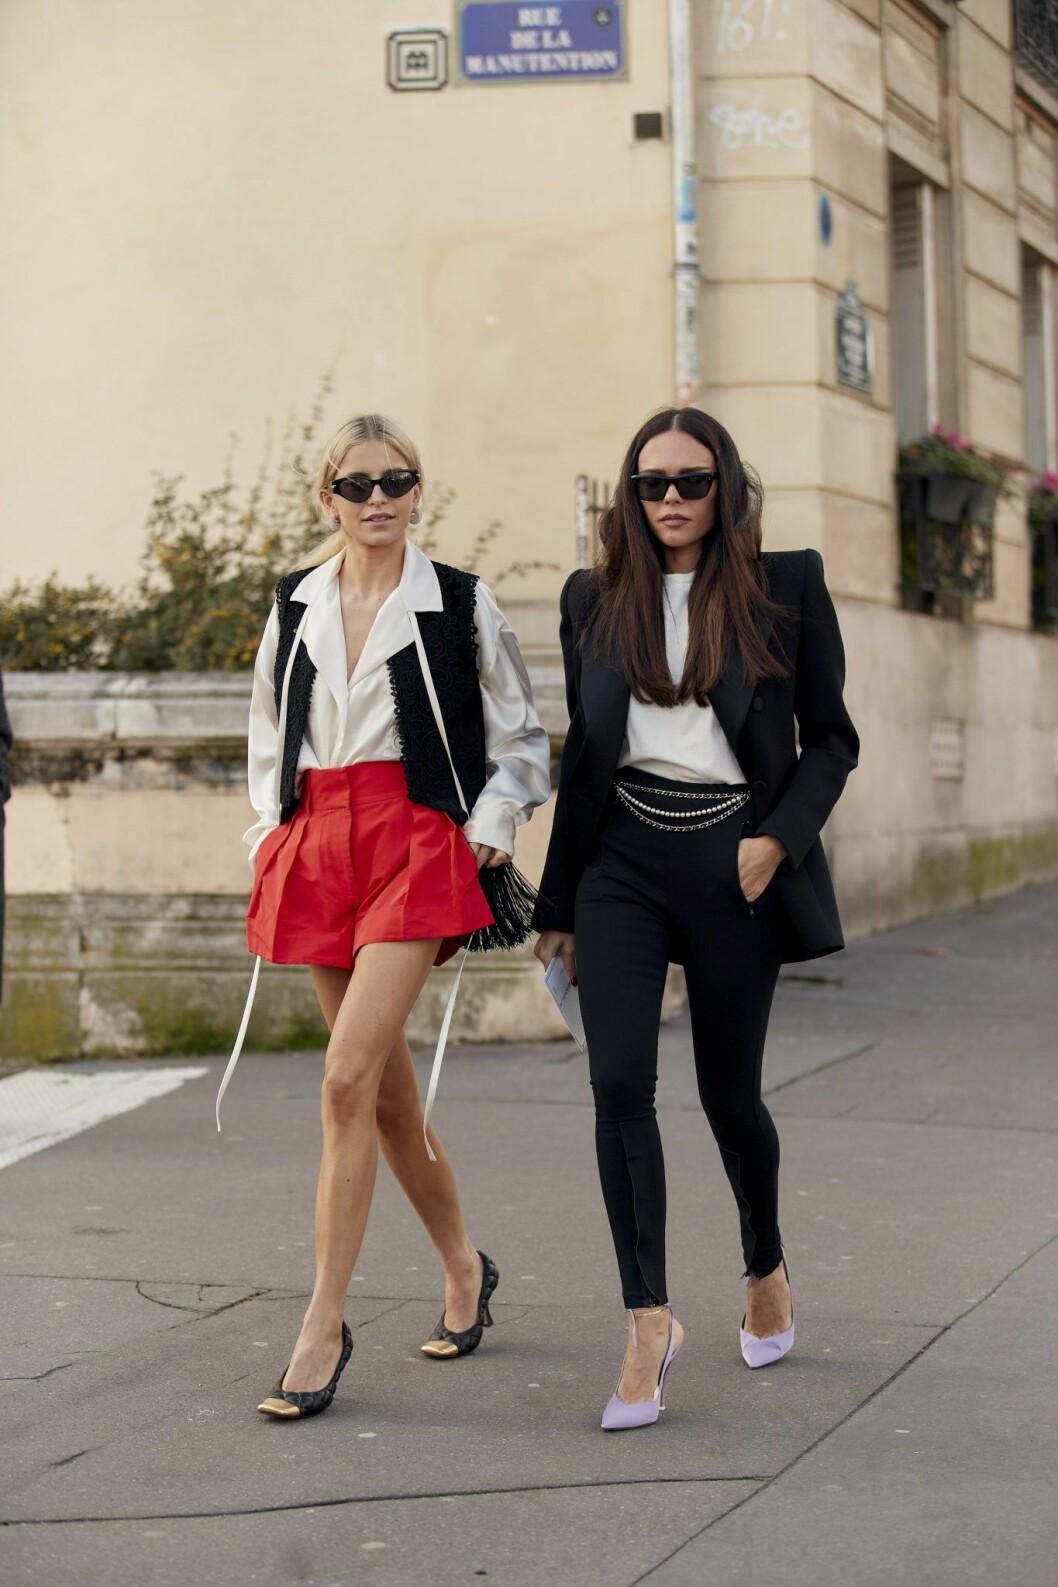 Lila klackskor Streetstyle Paris Fashion Week AW20.